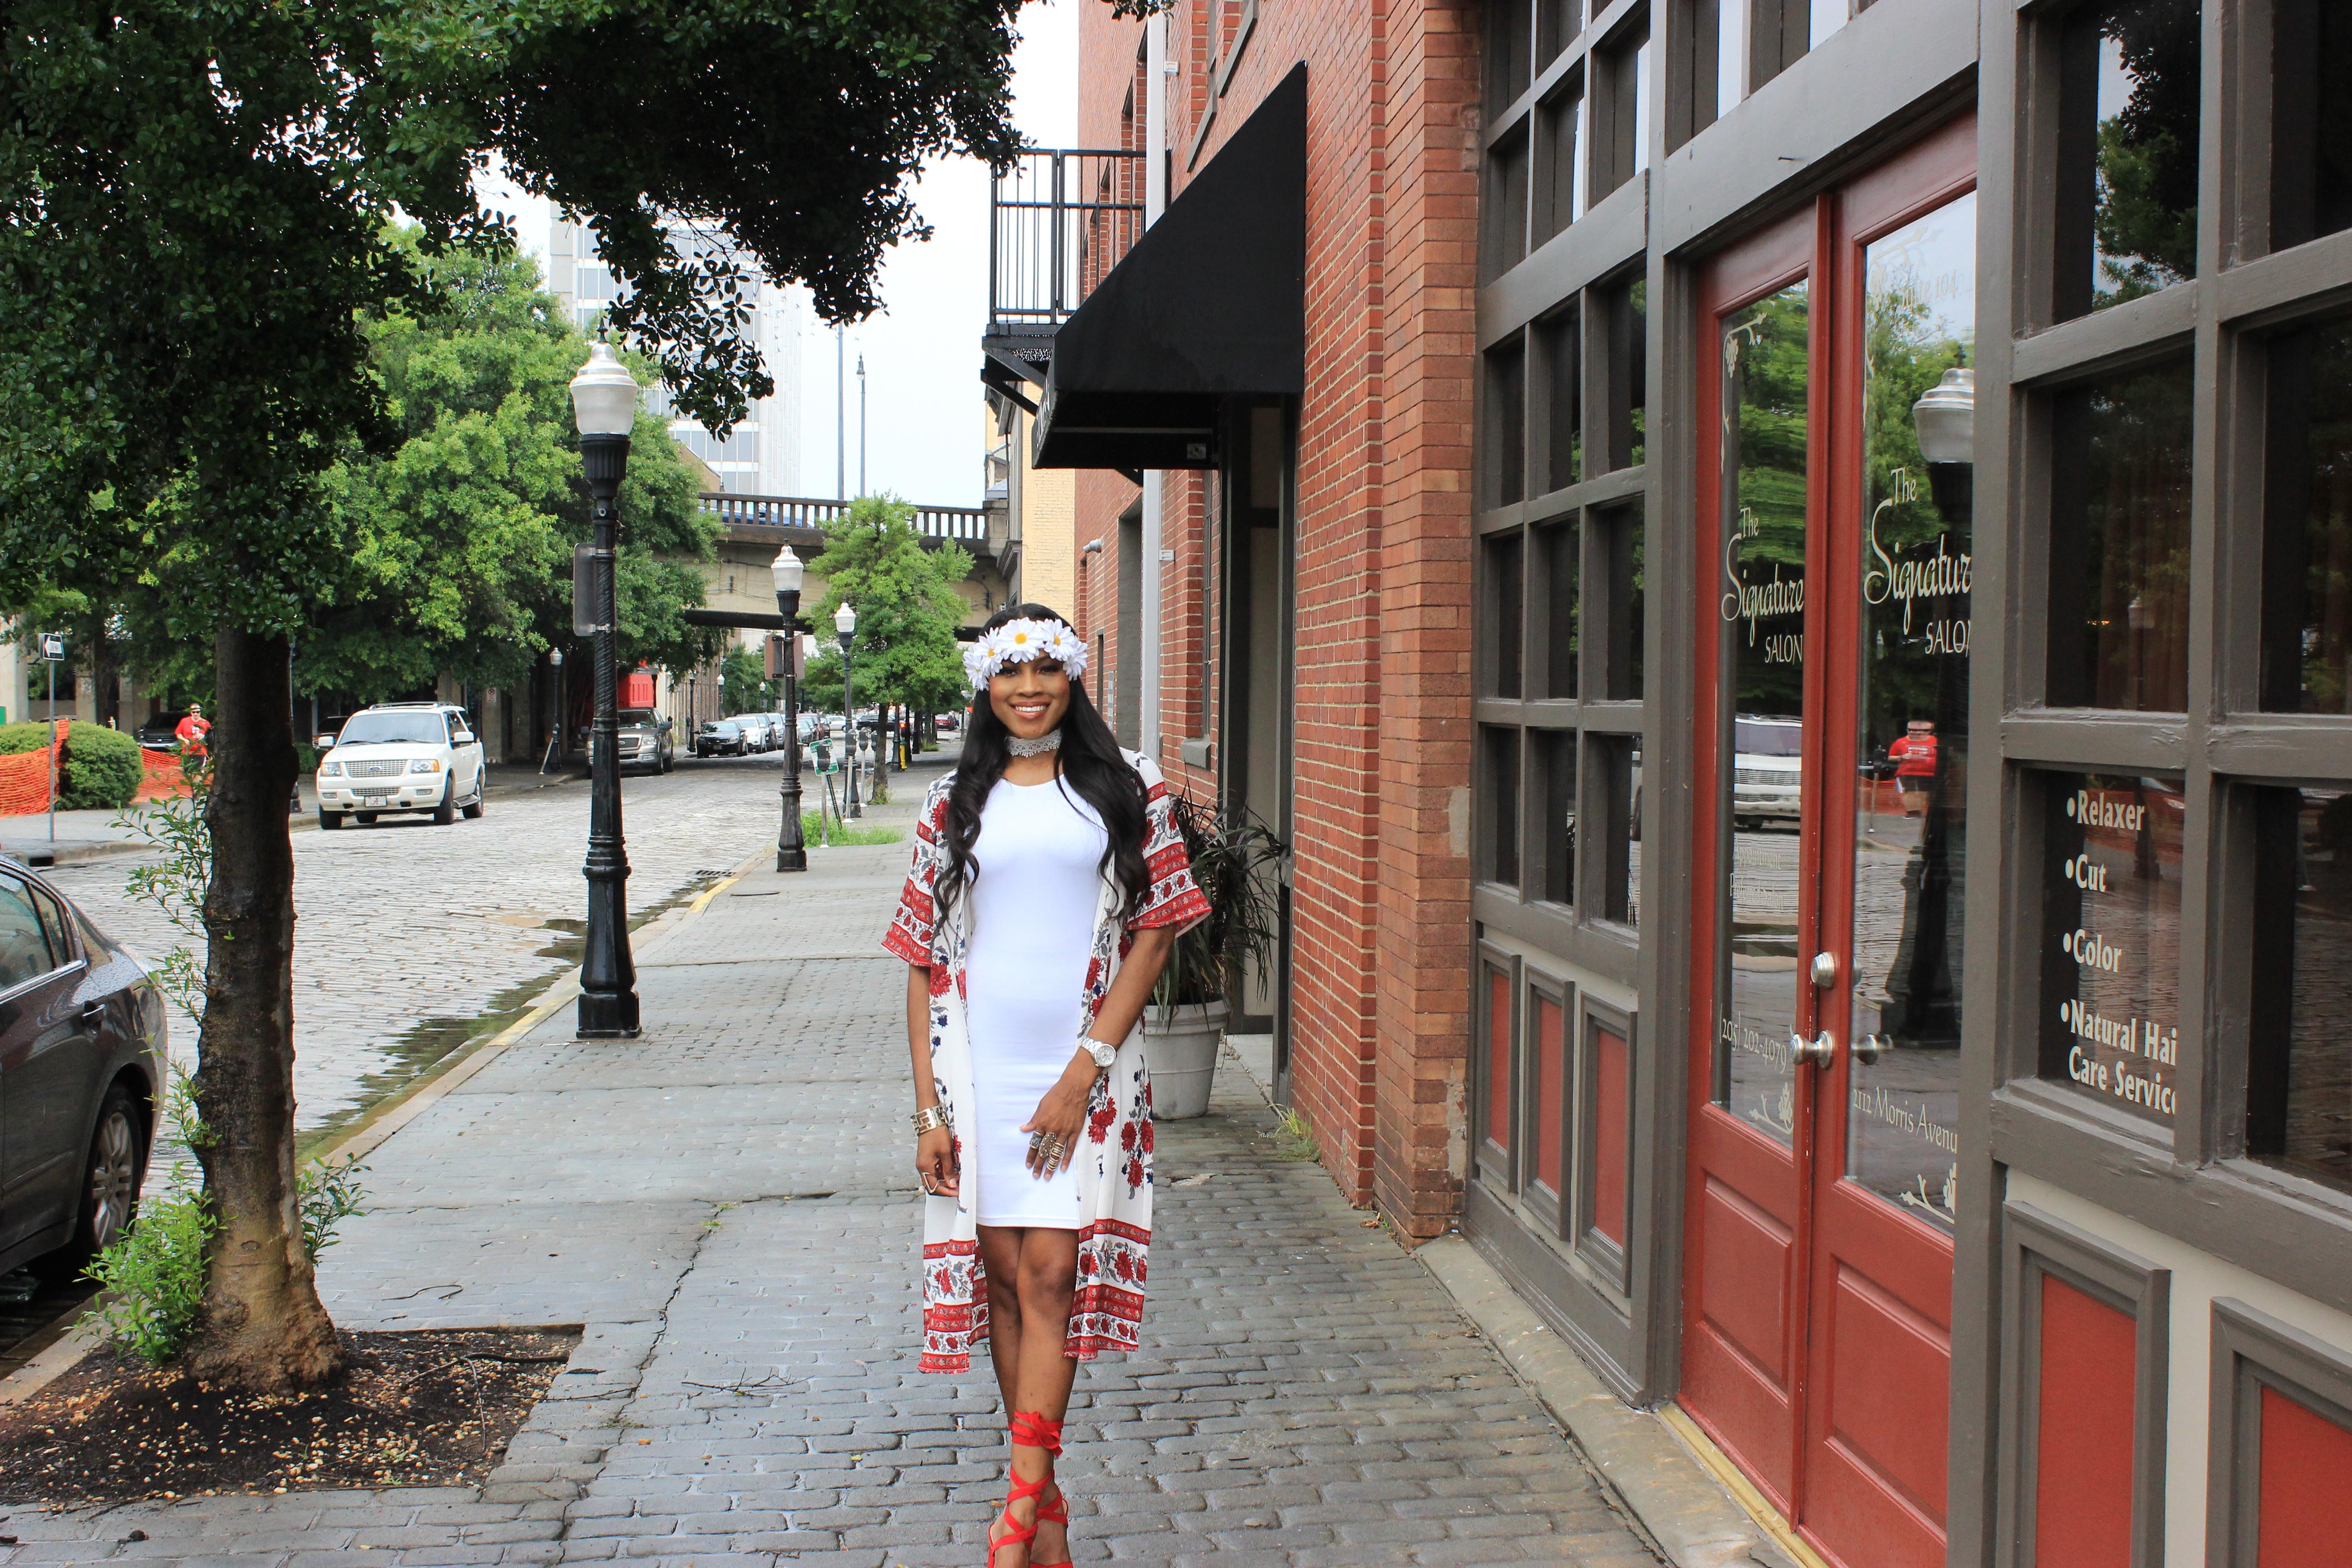 Style-Files-White-forever21-sleeveless-dress-boohoo-Lucy Border Print Maxi Shortsleeve Kimono-Boohoo-ruby-Scalloped Lace Choker-Public-desire-red-lace-uP-heels-forever-21-daisy-headband-oohlalablog-18